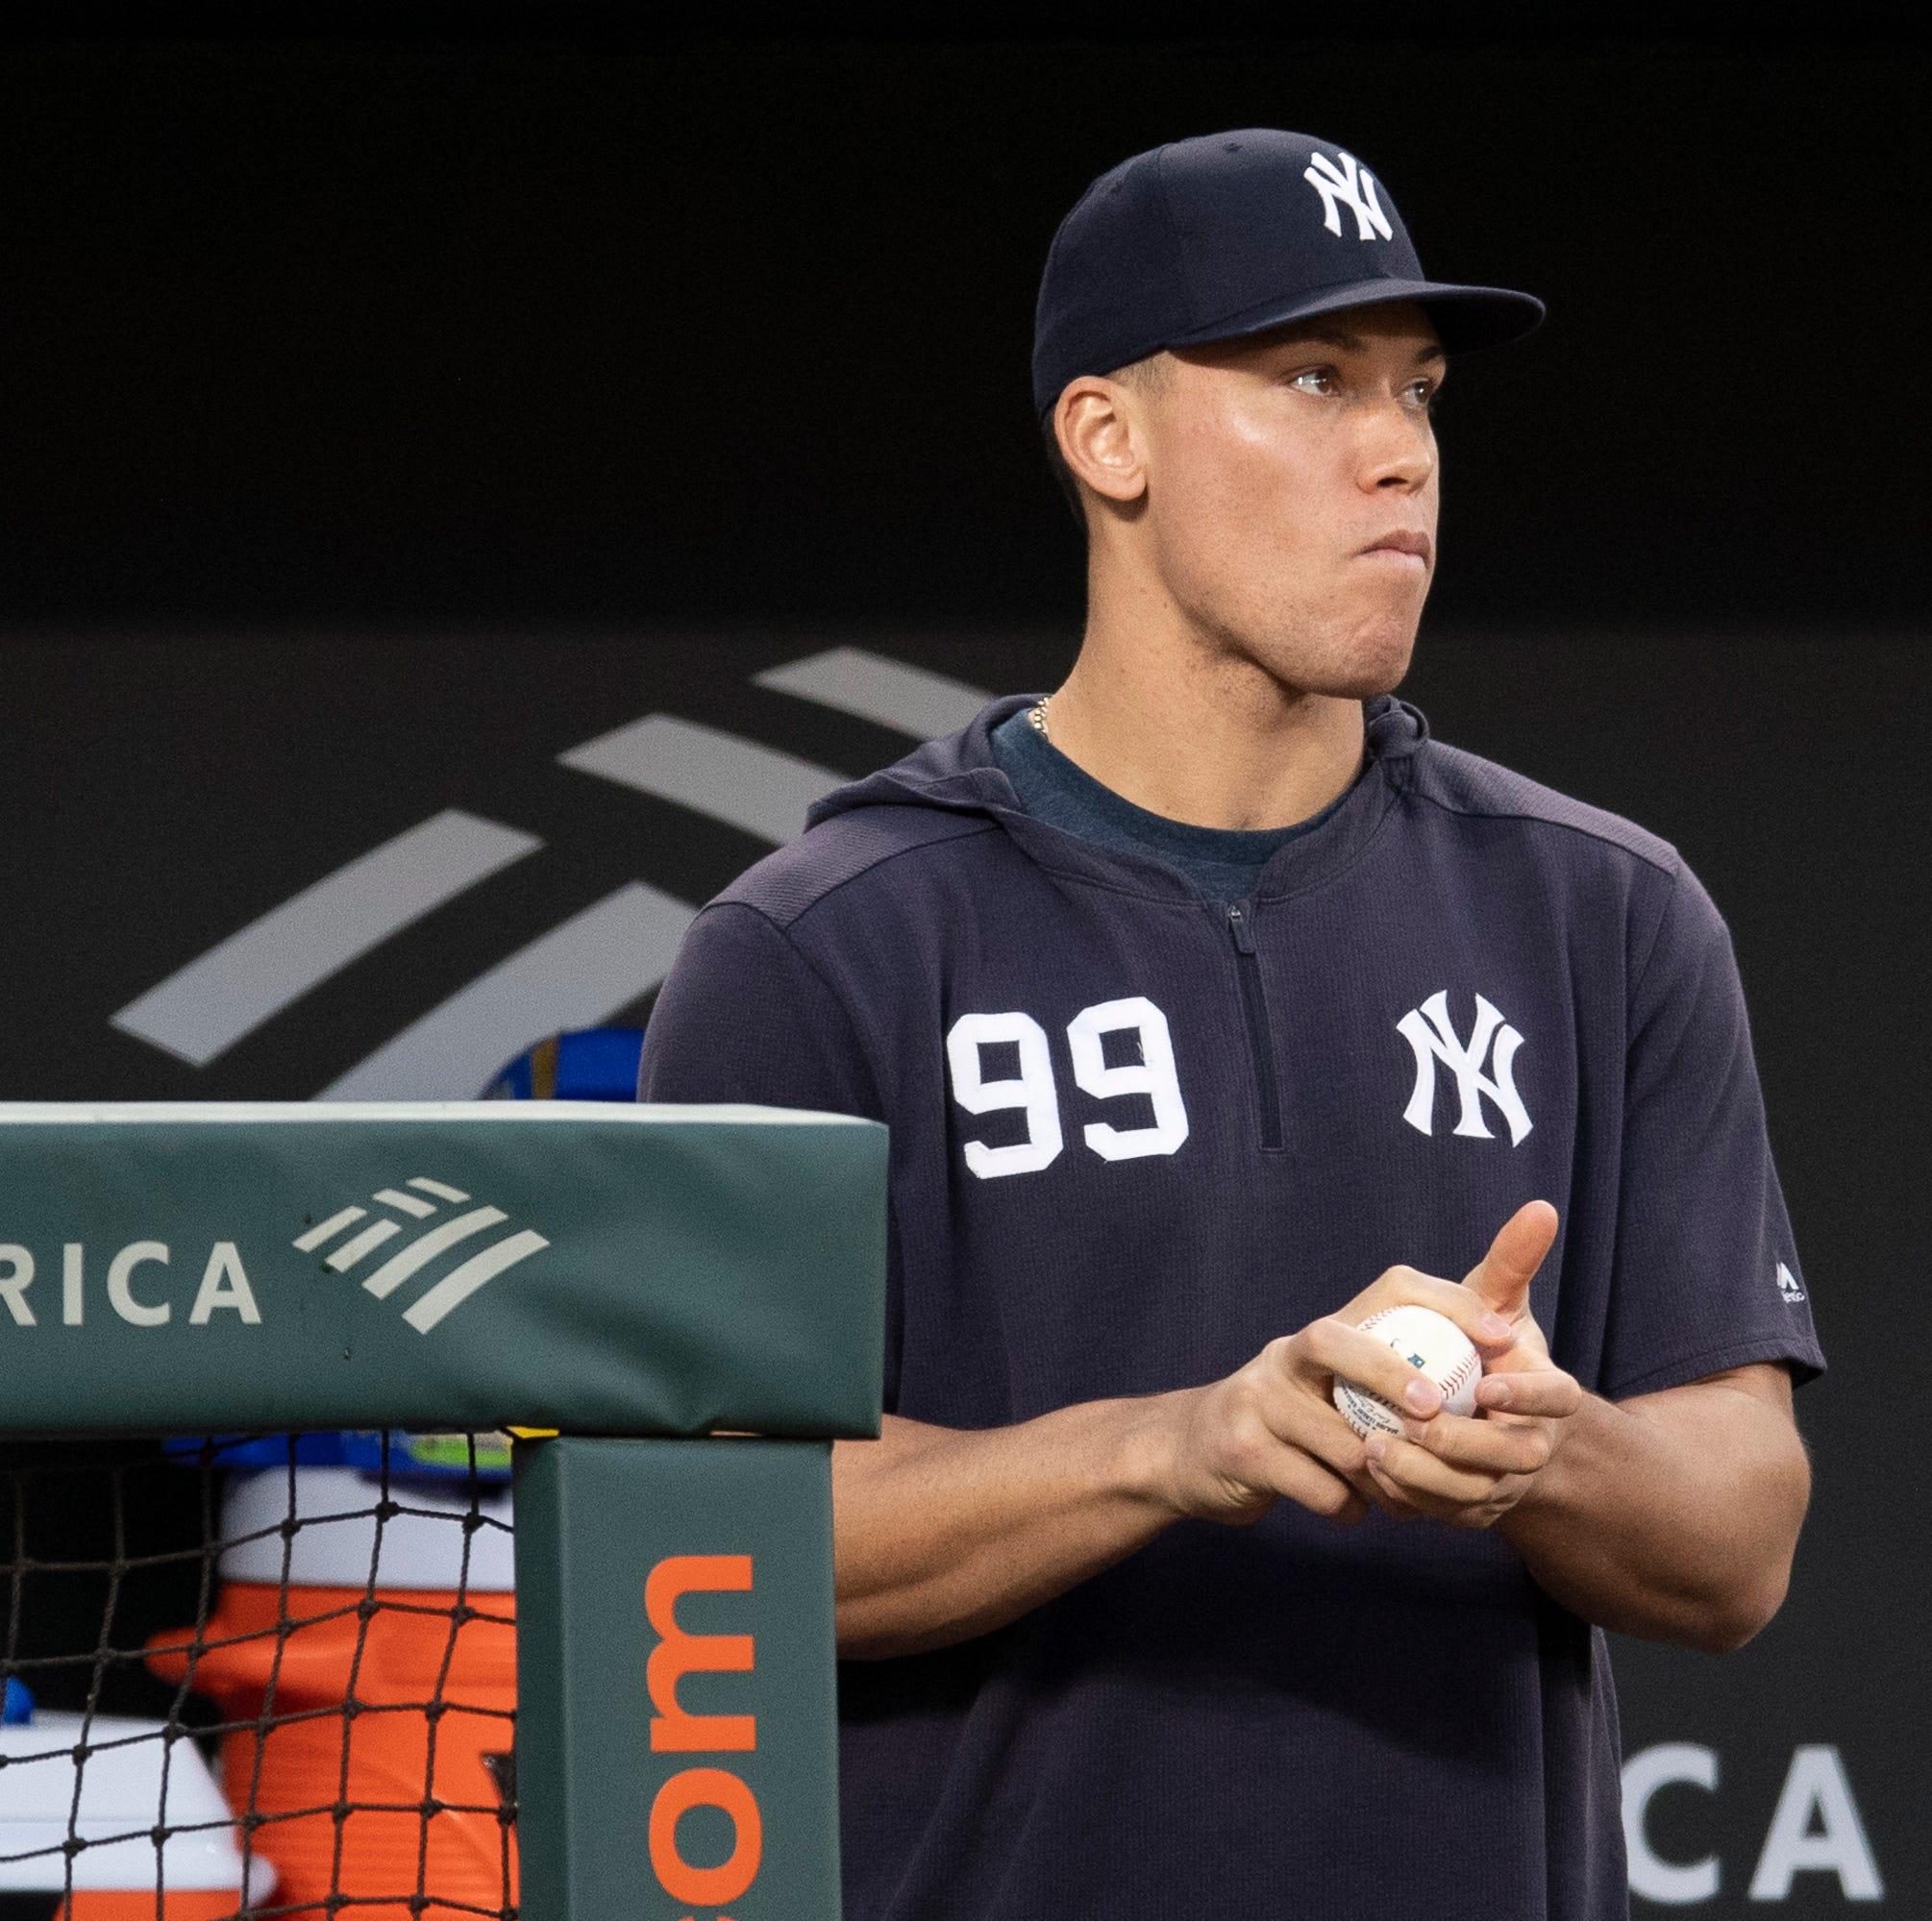 Yankees' injured slugger Aaron Judge could resume swinging a bat this week